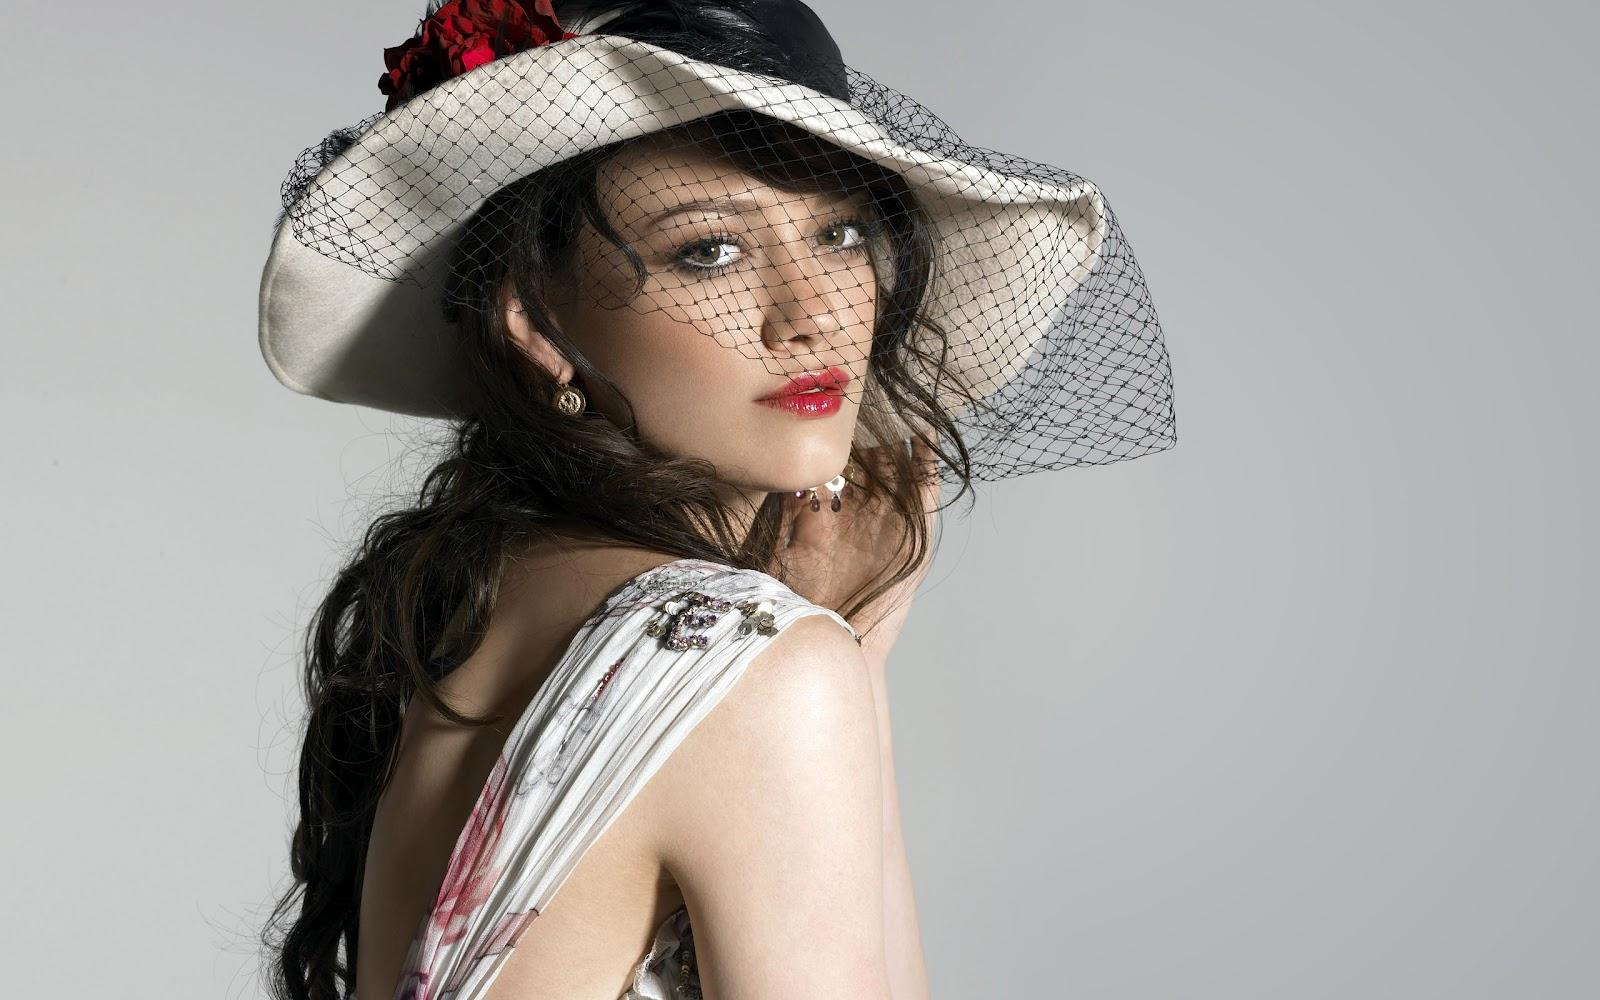 http://3.bp.blogspot.com/-jfiAVAKYvo4/Tzvww8WAI6I/AAAAAAAAA4Q/BZ-hJH-Ppsg/s1600/Hilary+%2810%29.jpg